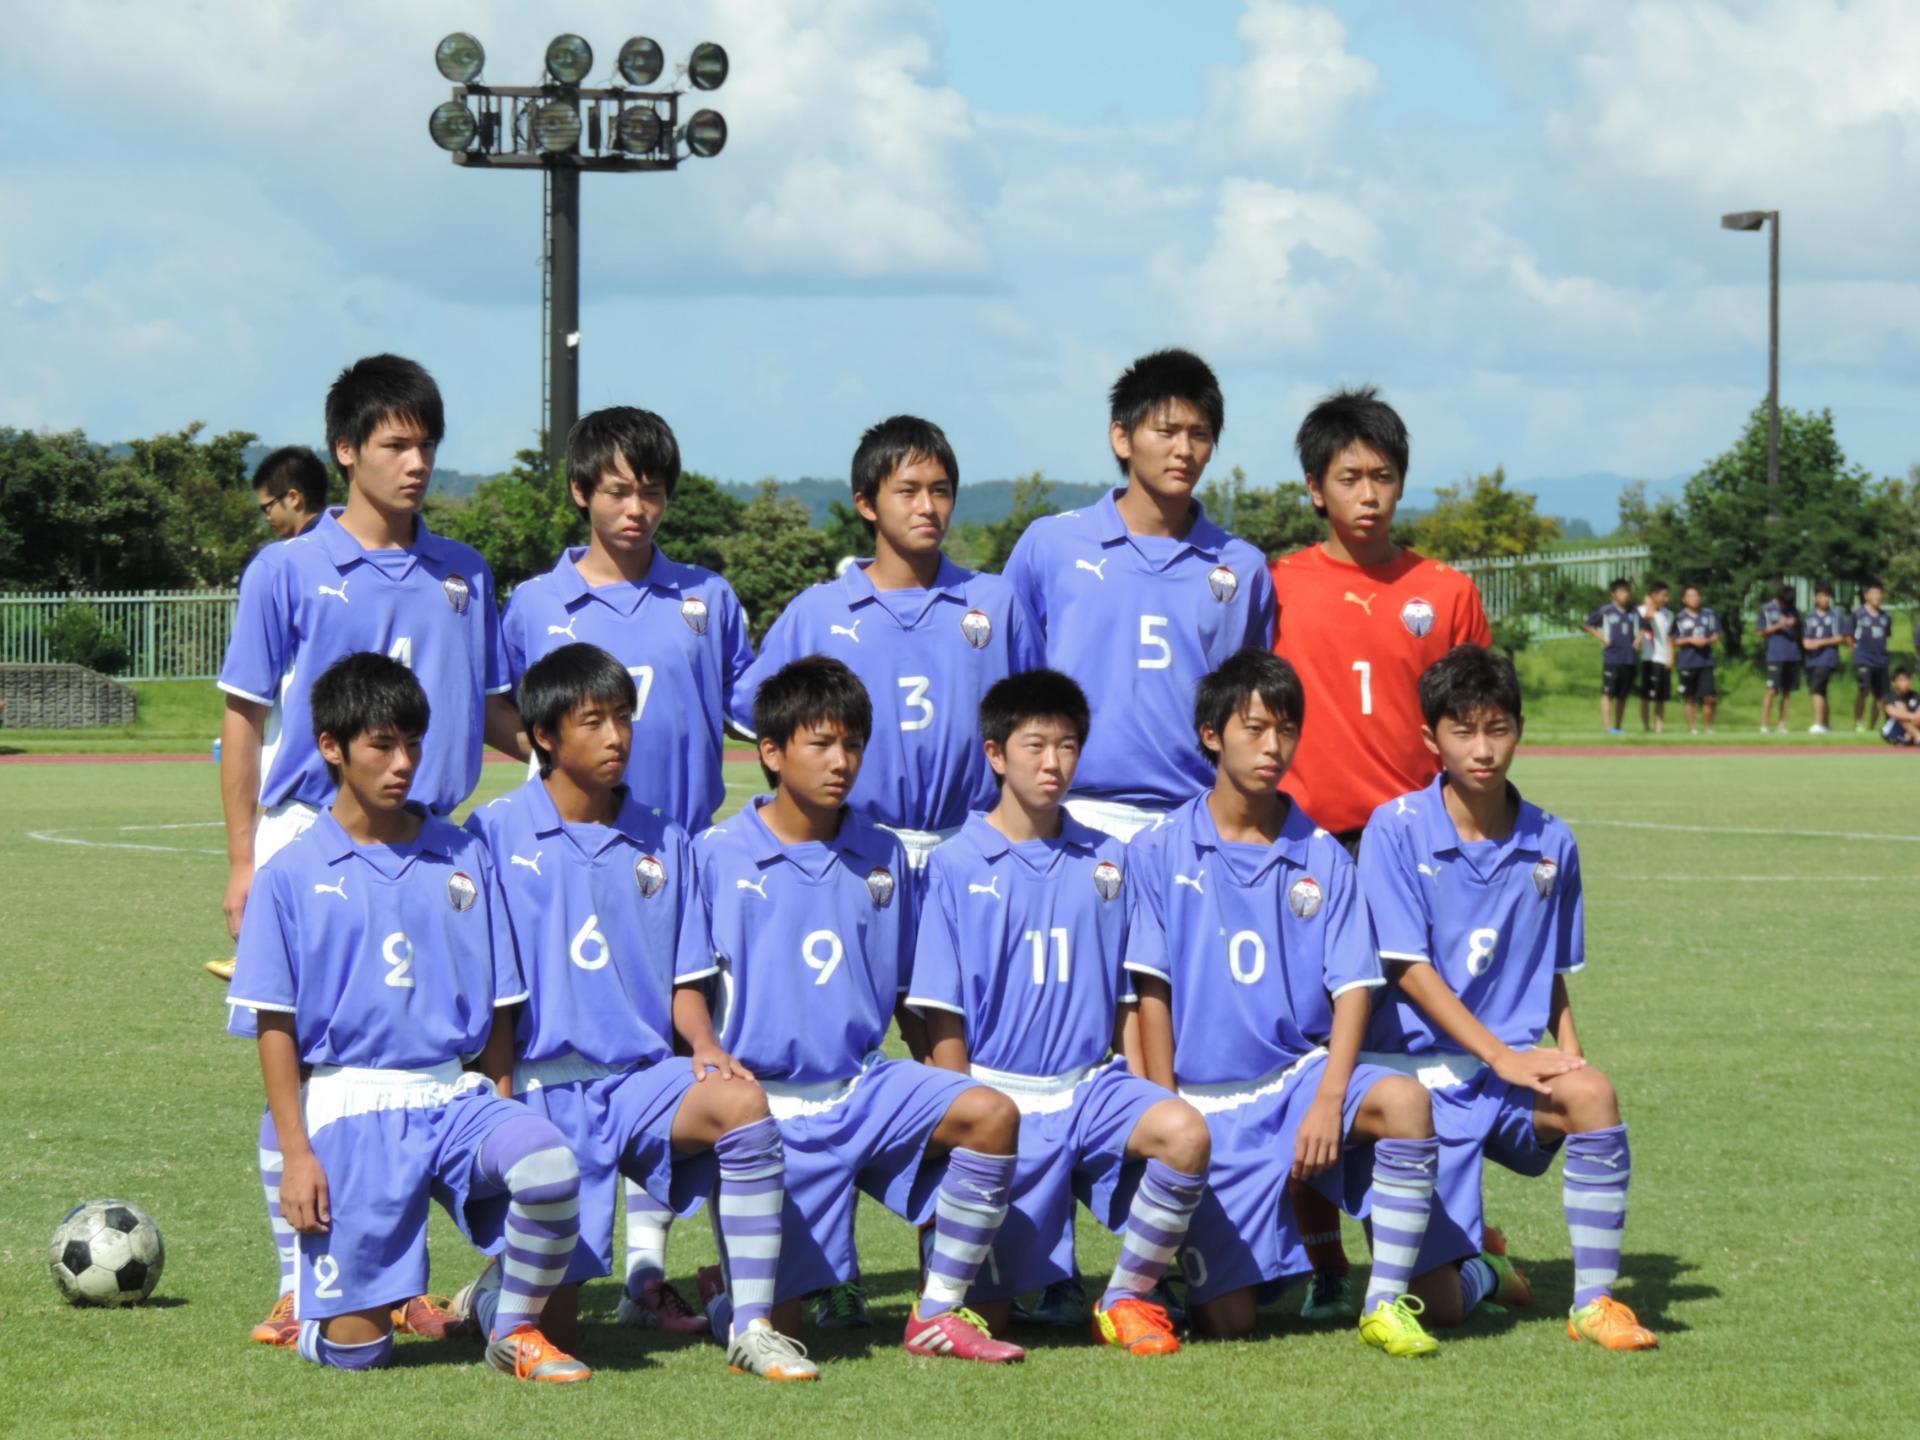 T1リーグ 参入戦① - 富山第一高校サッカー部 TOMIICHI FC 2014